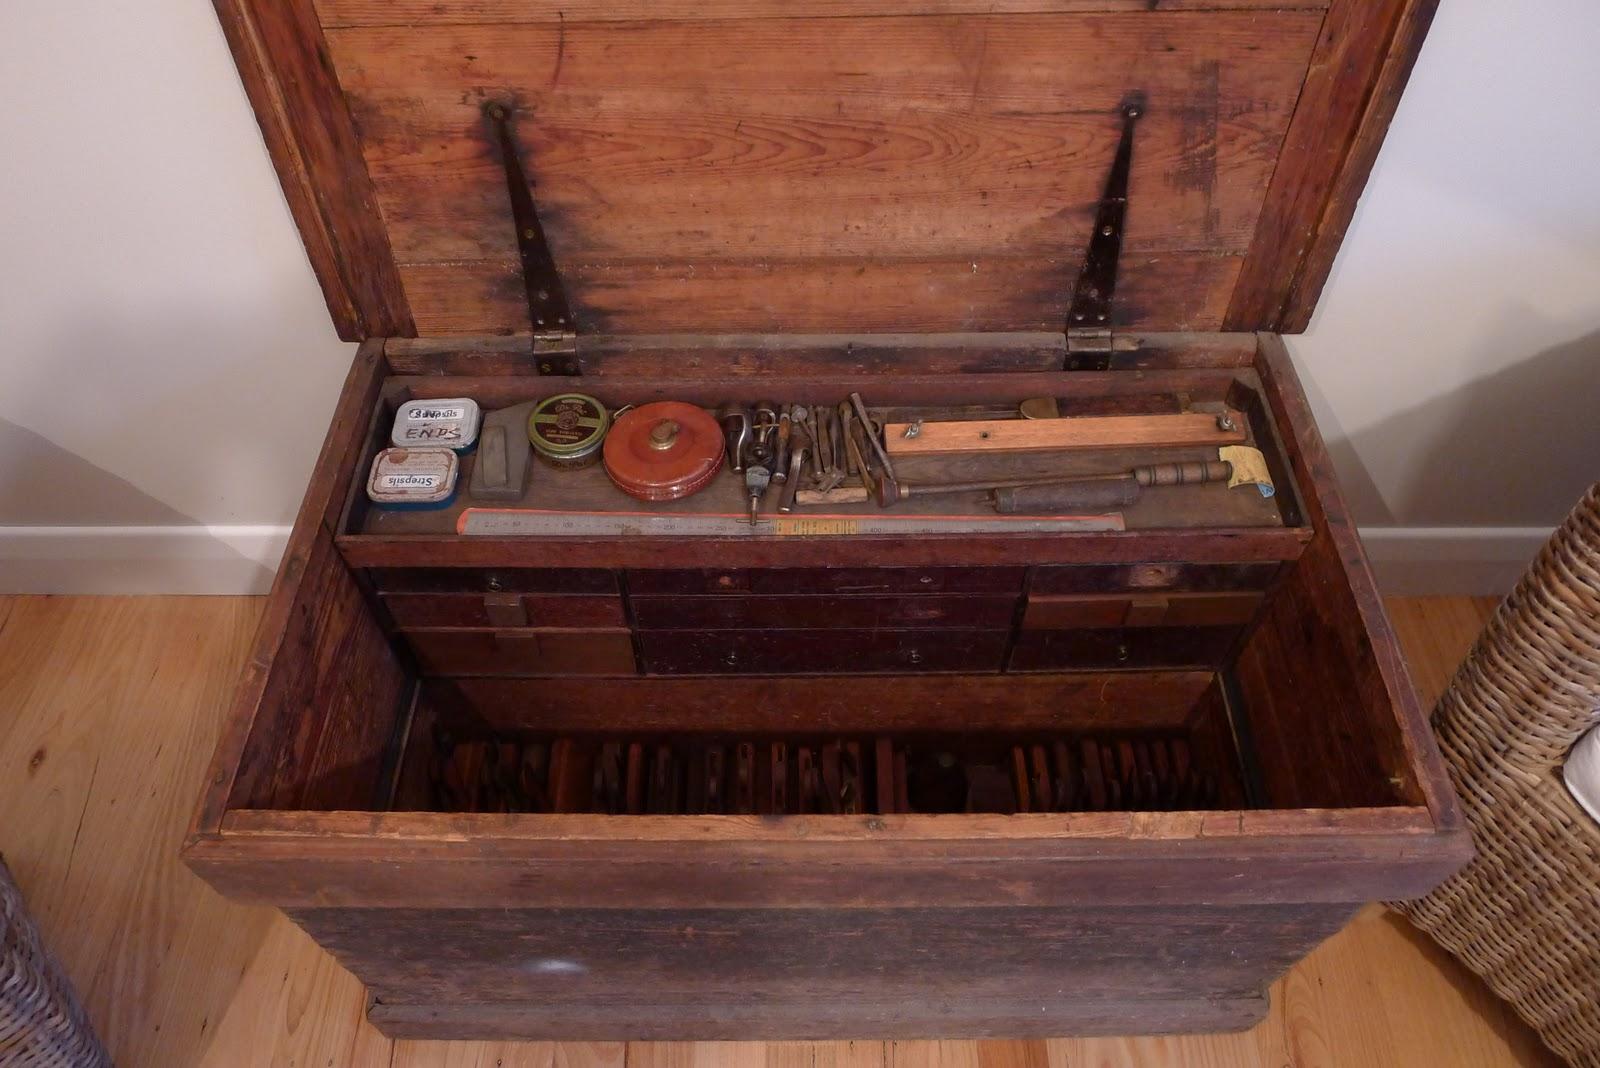 Rundell & Rundell: The George Thwaites Tool Chest